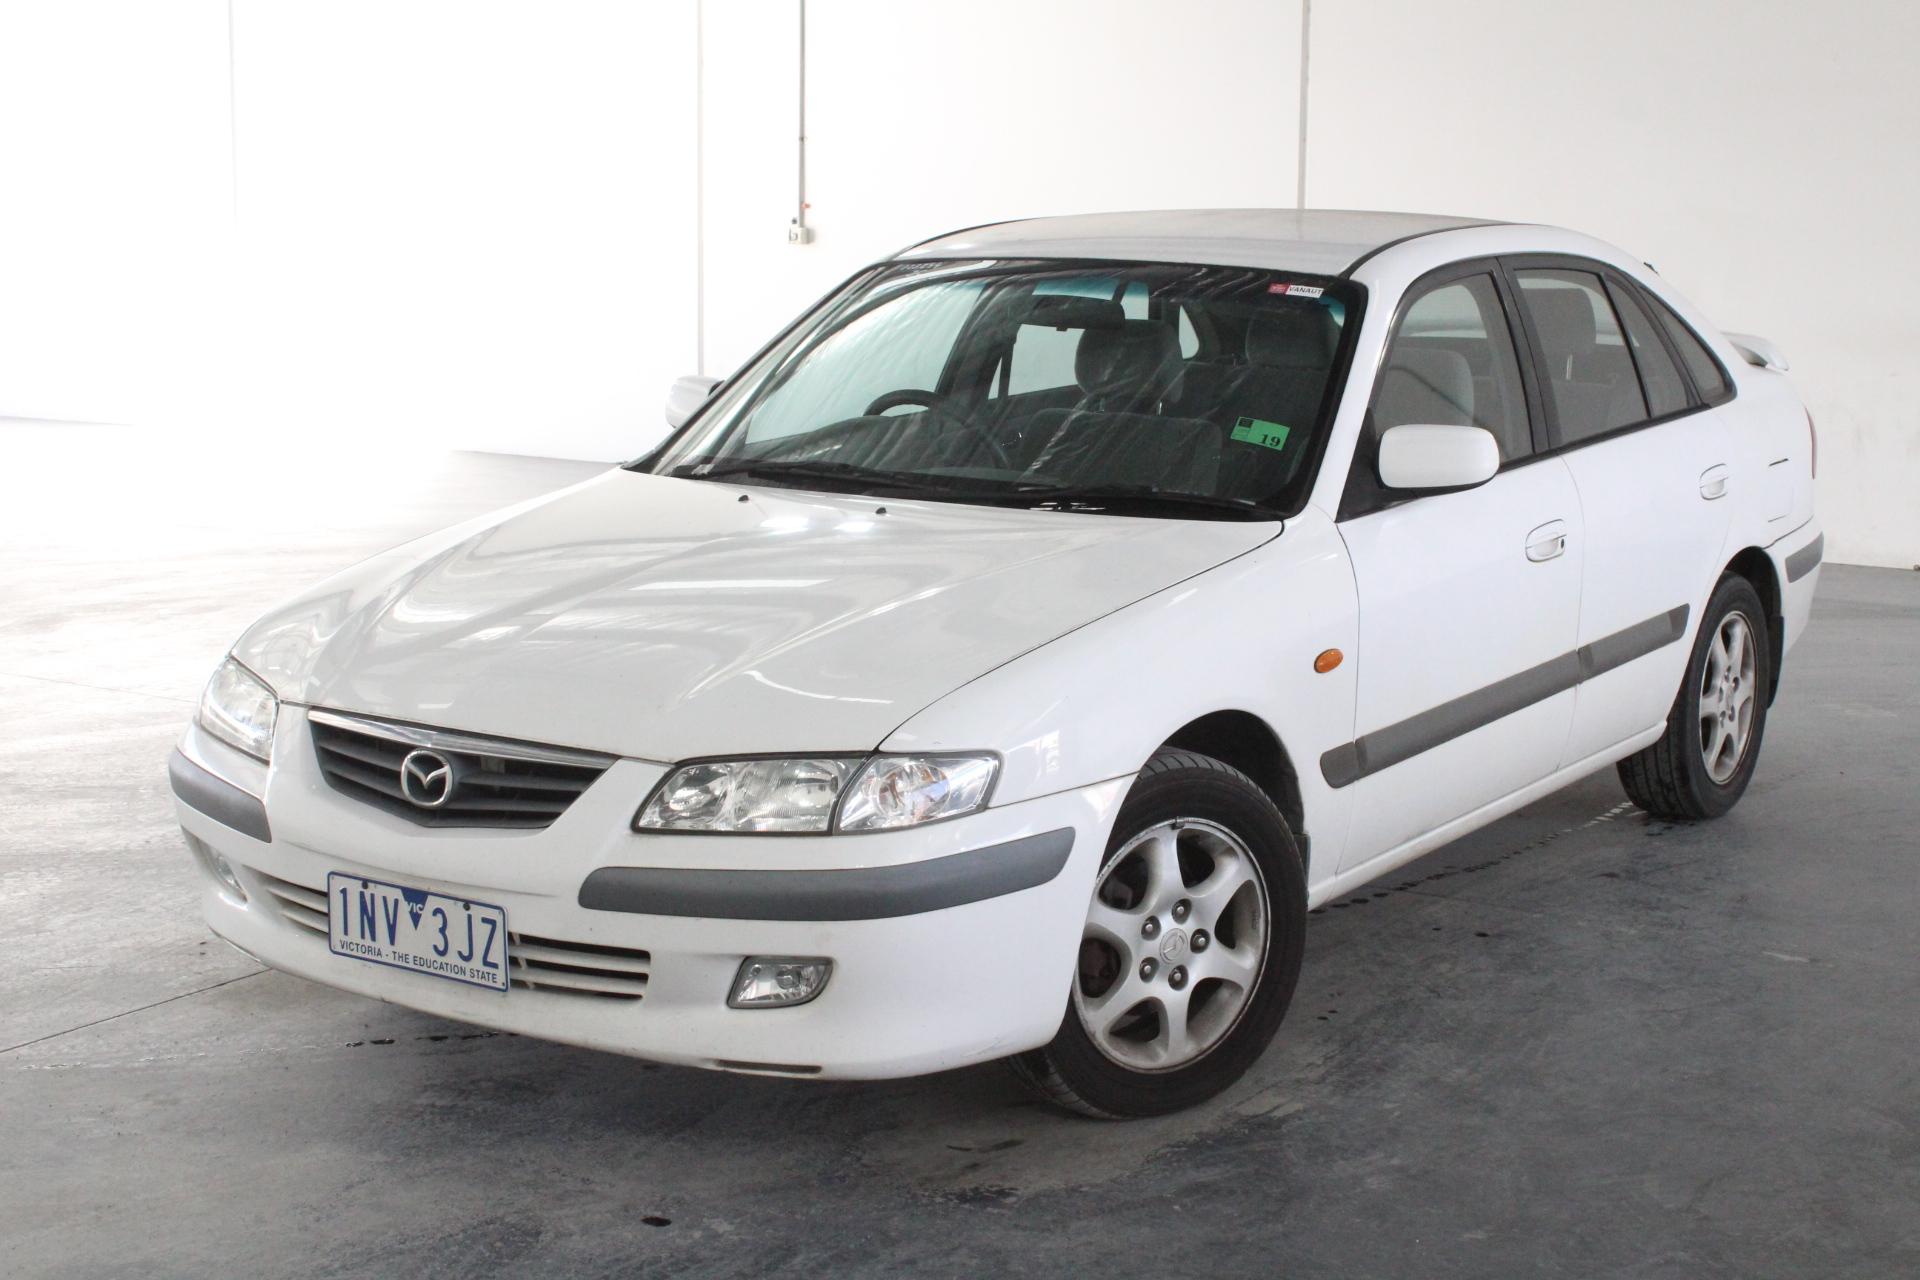 1999 Mazda 626 Classic GF Automatic Hatchback